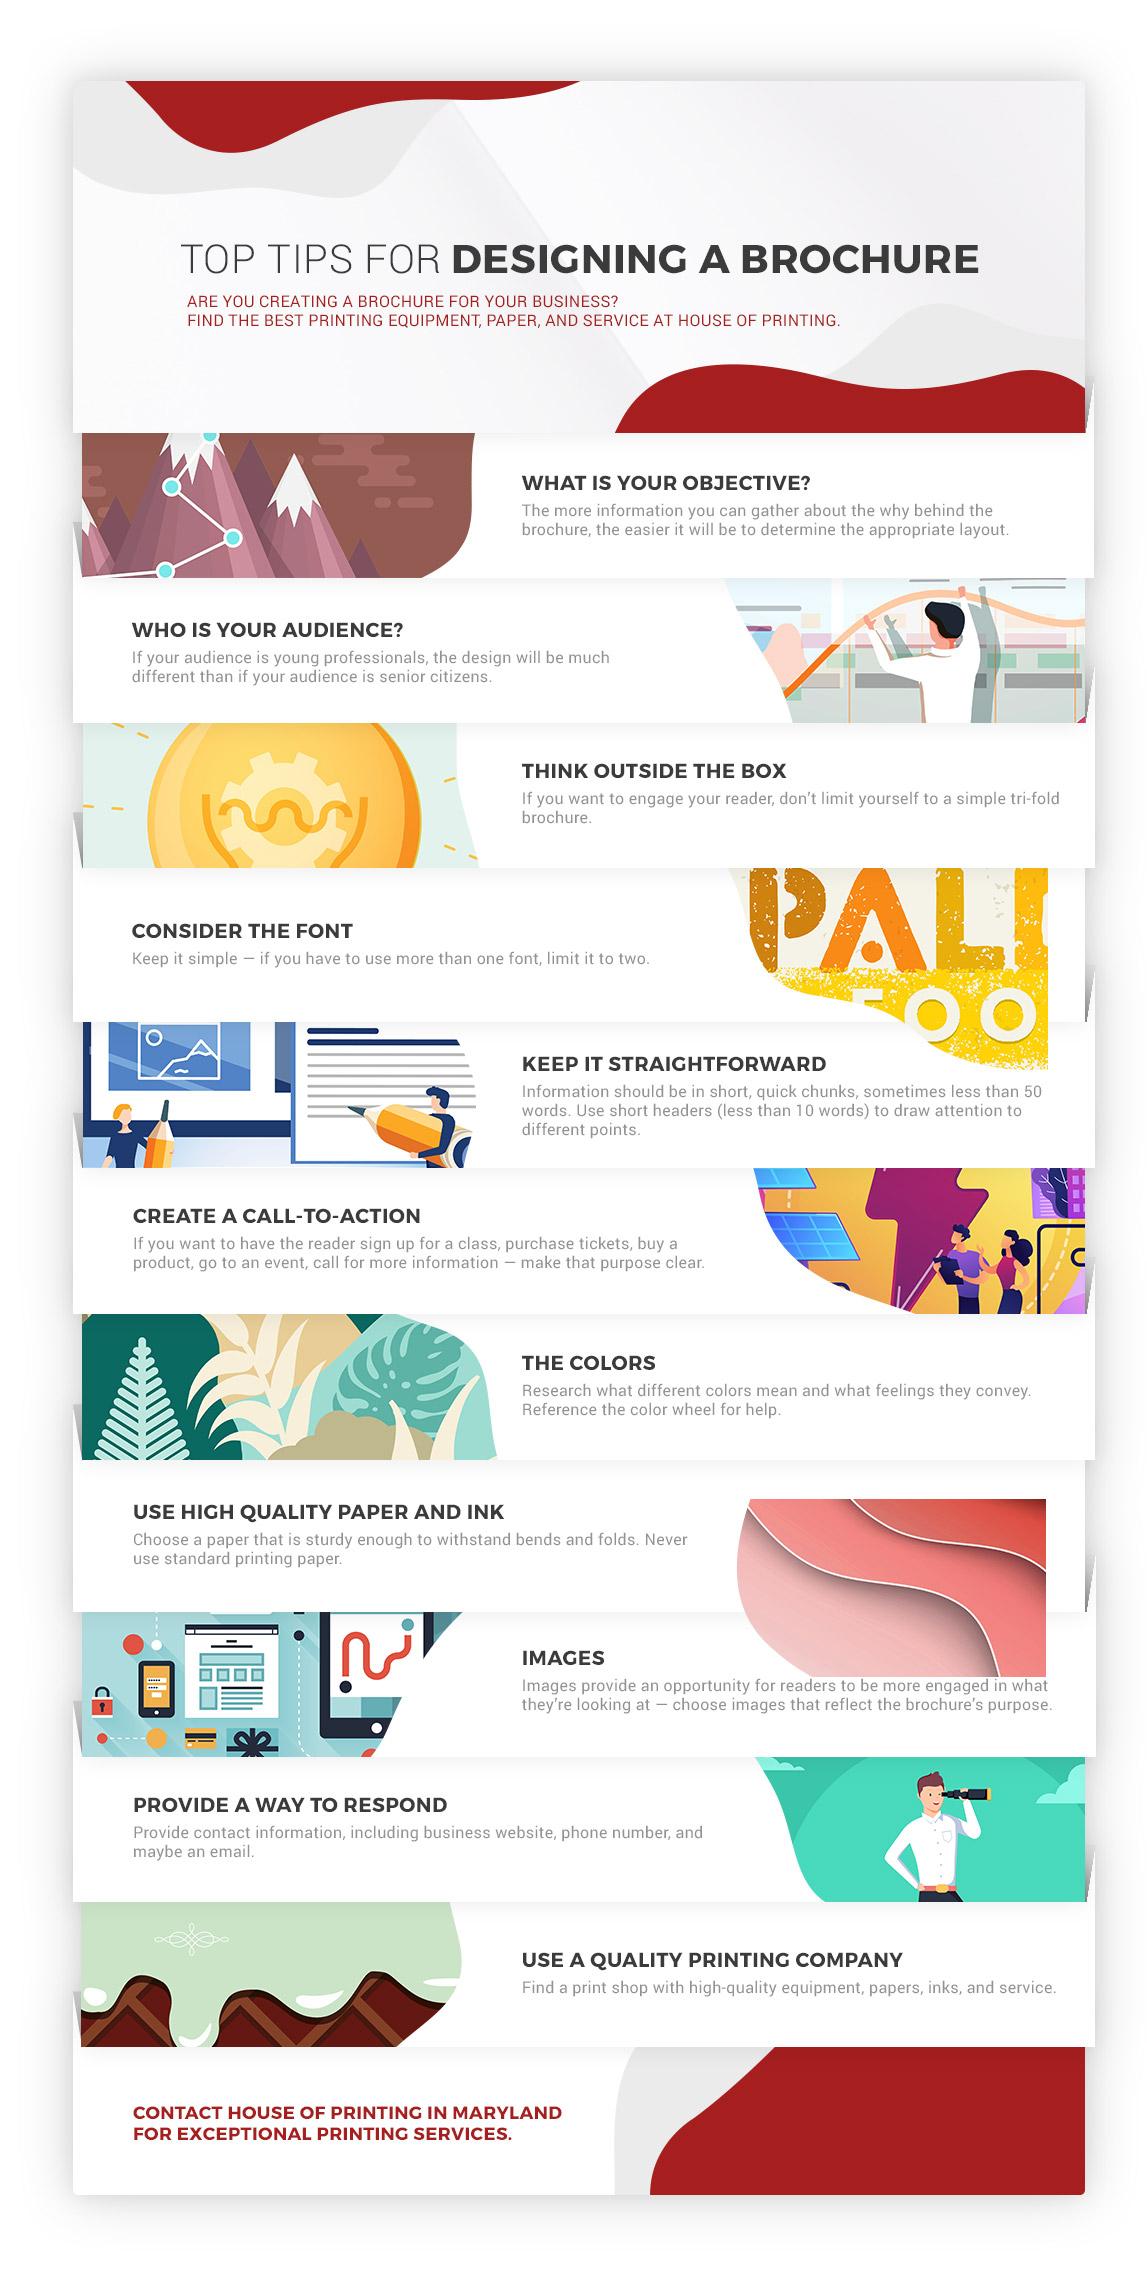 Print Shop Burtonsville: How to Design an Effective Brochure